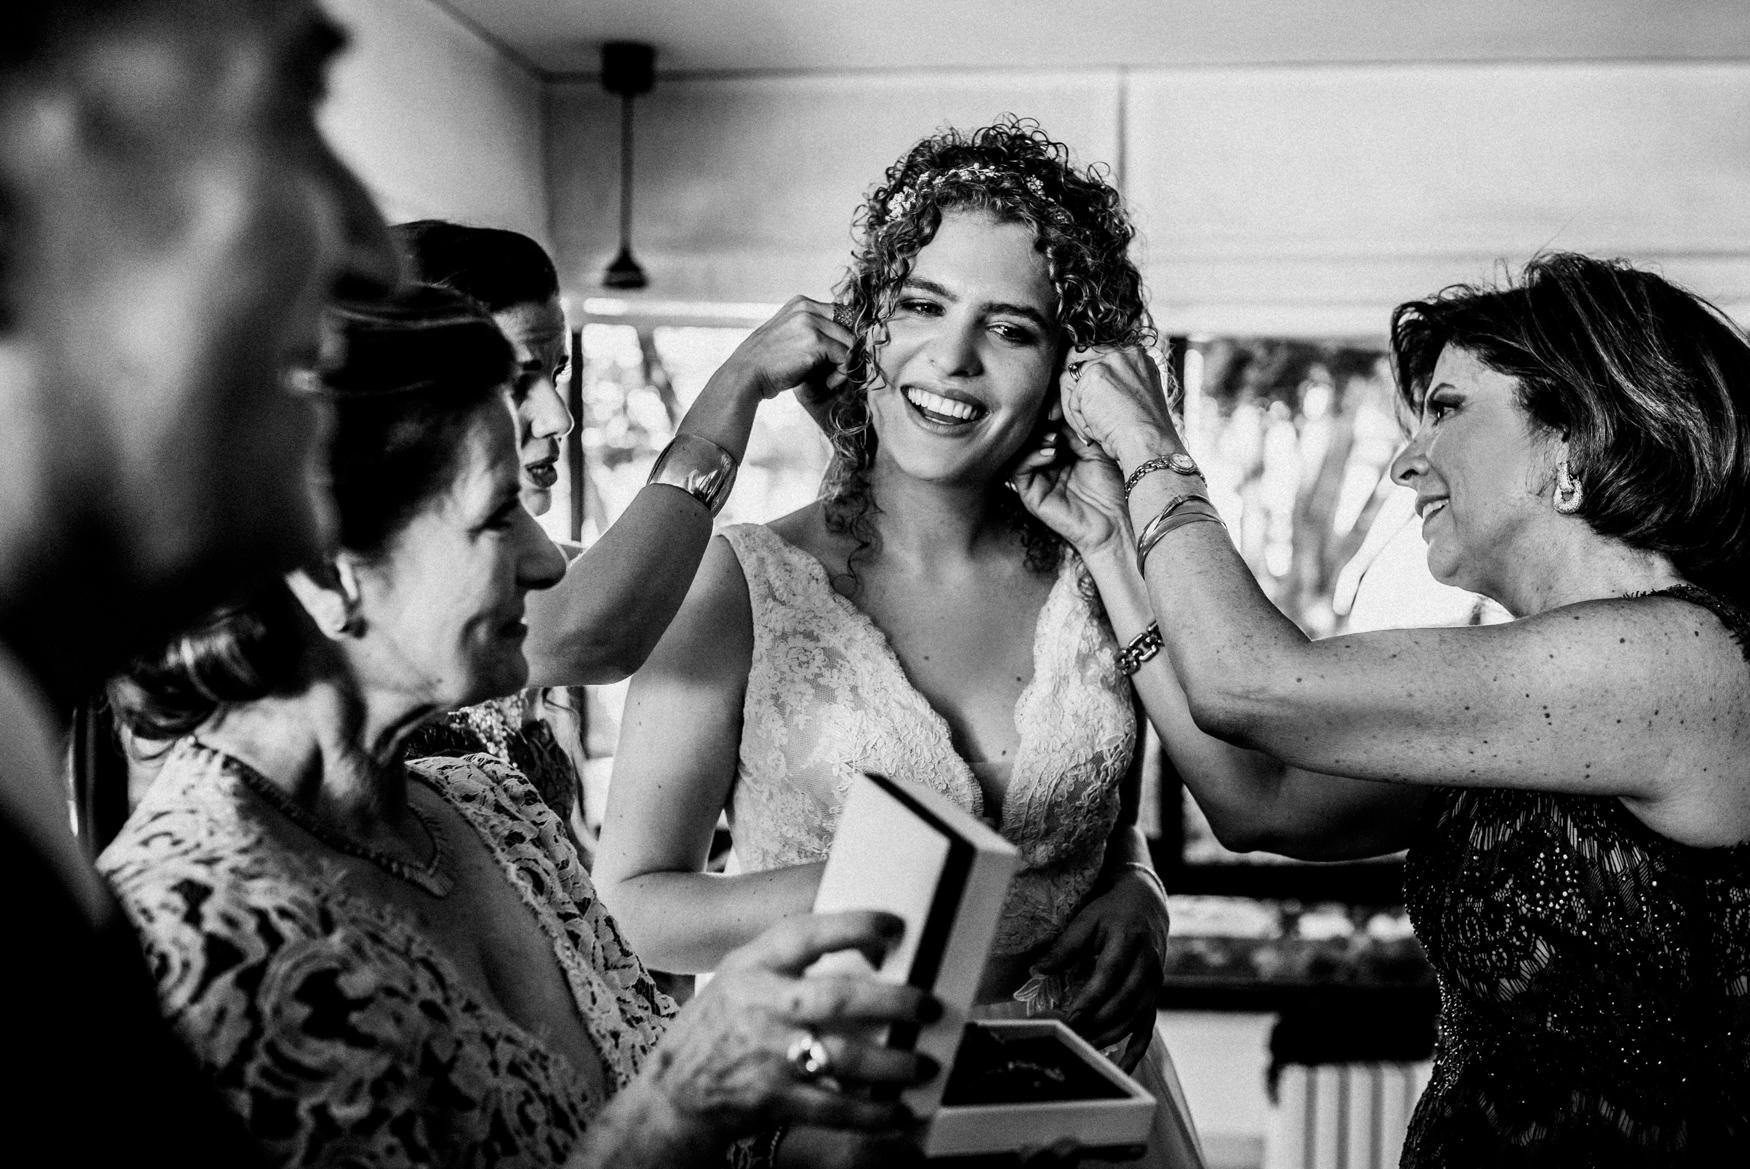 LR2 beirut byblos wedding photographer lebanon 031.jpg